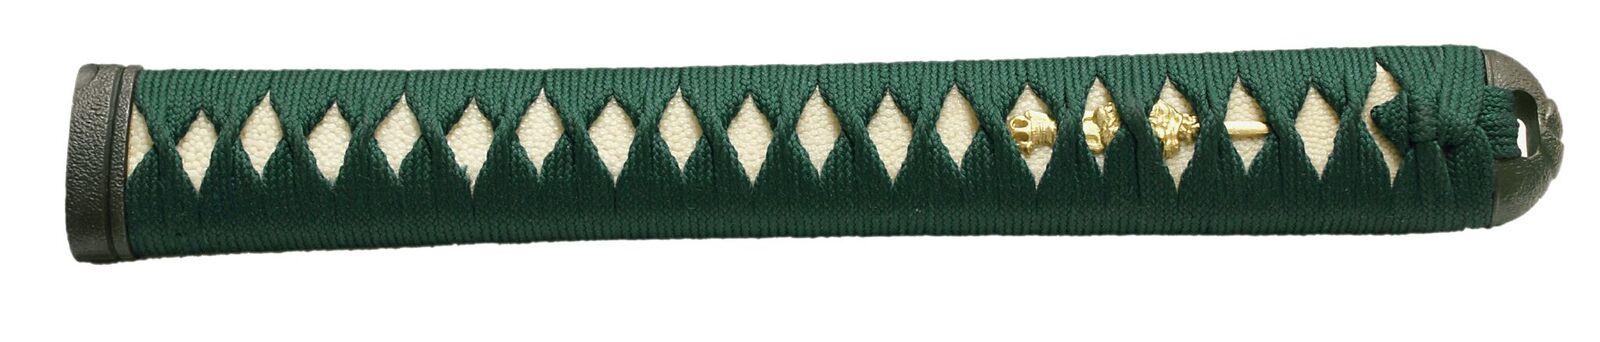 Green Ito Wrap